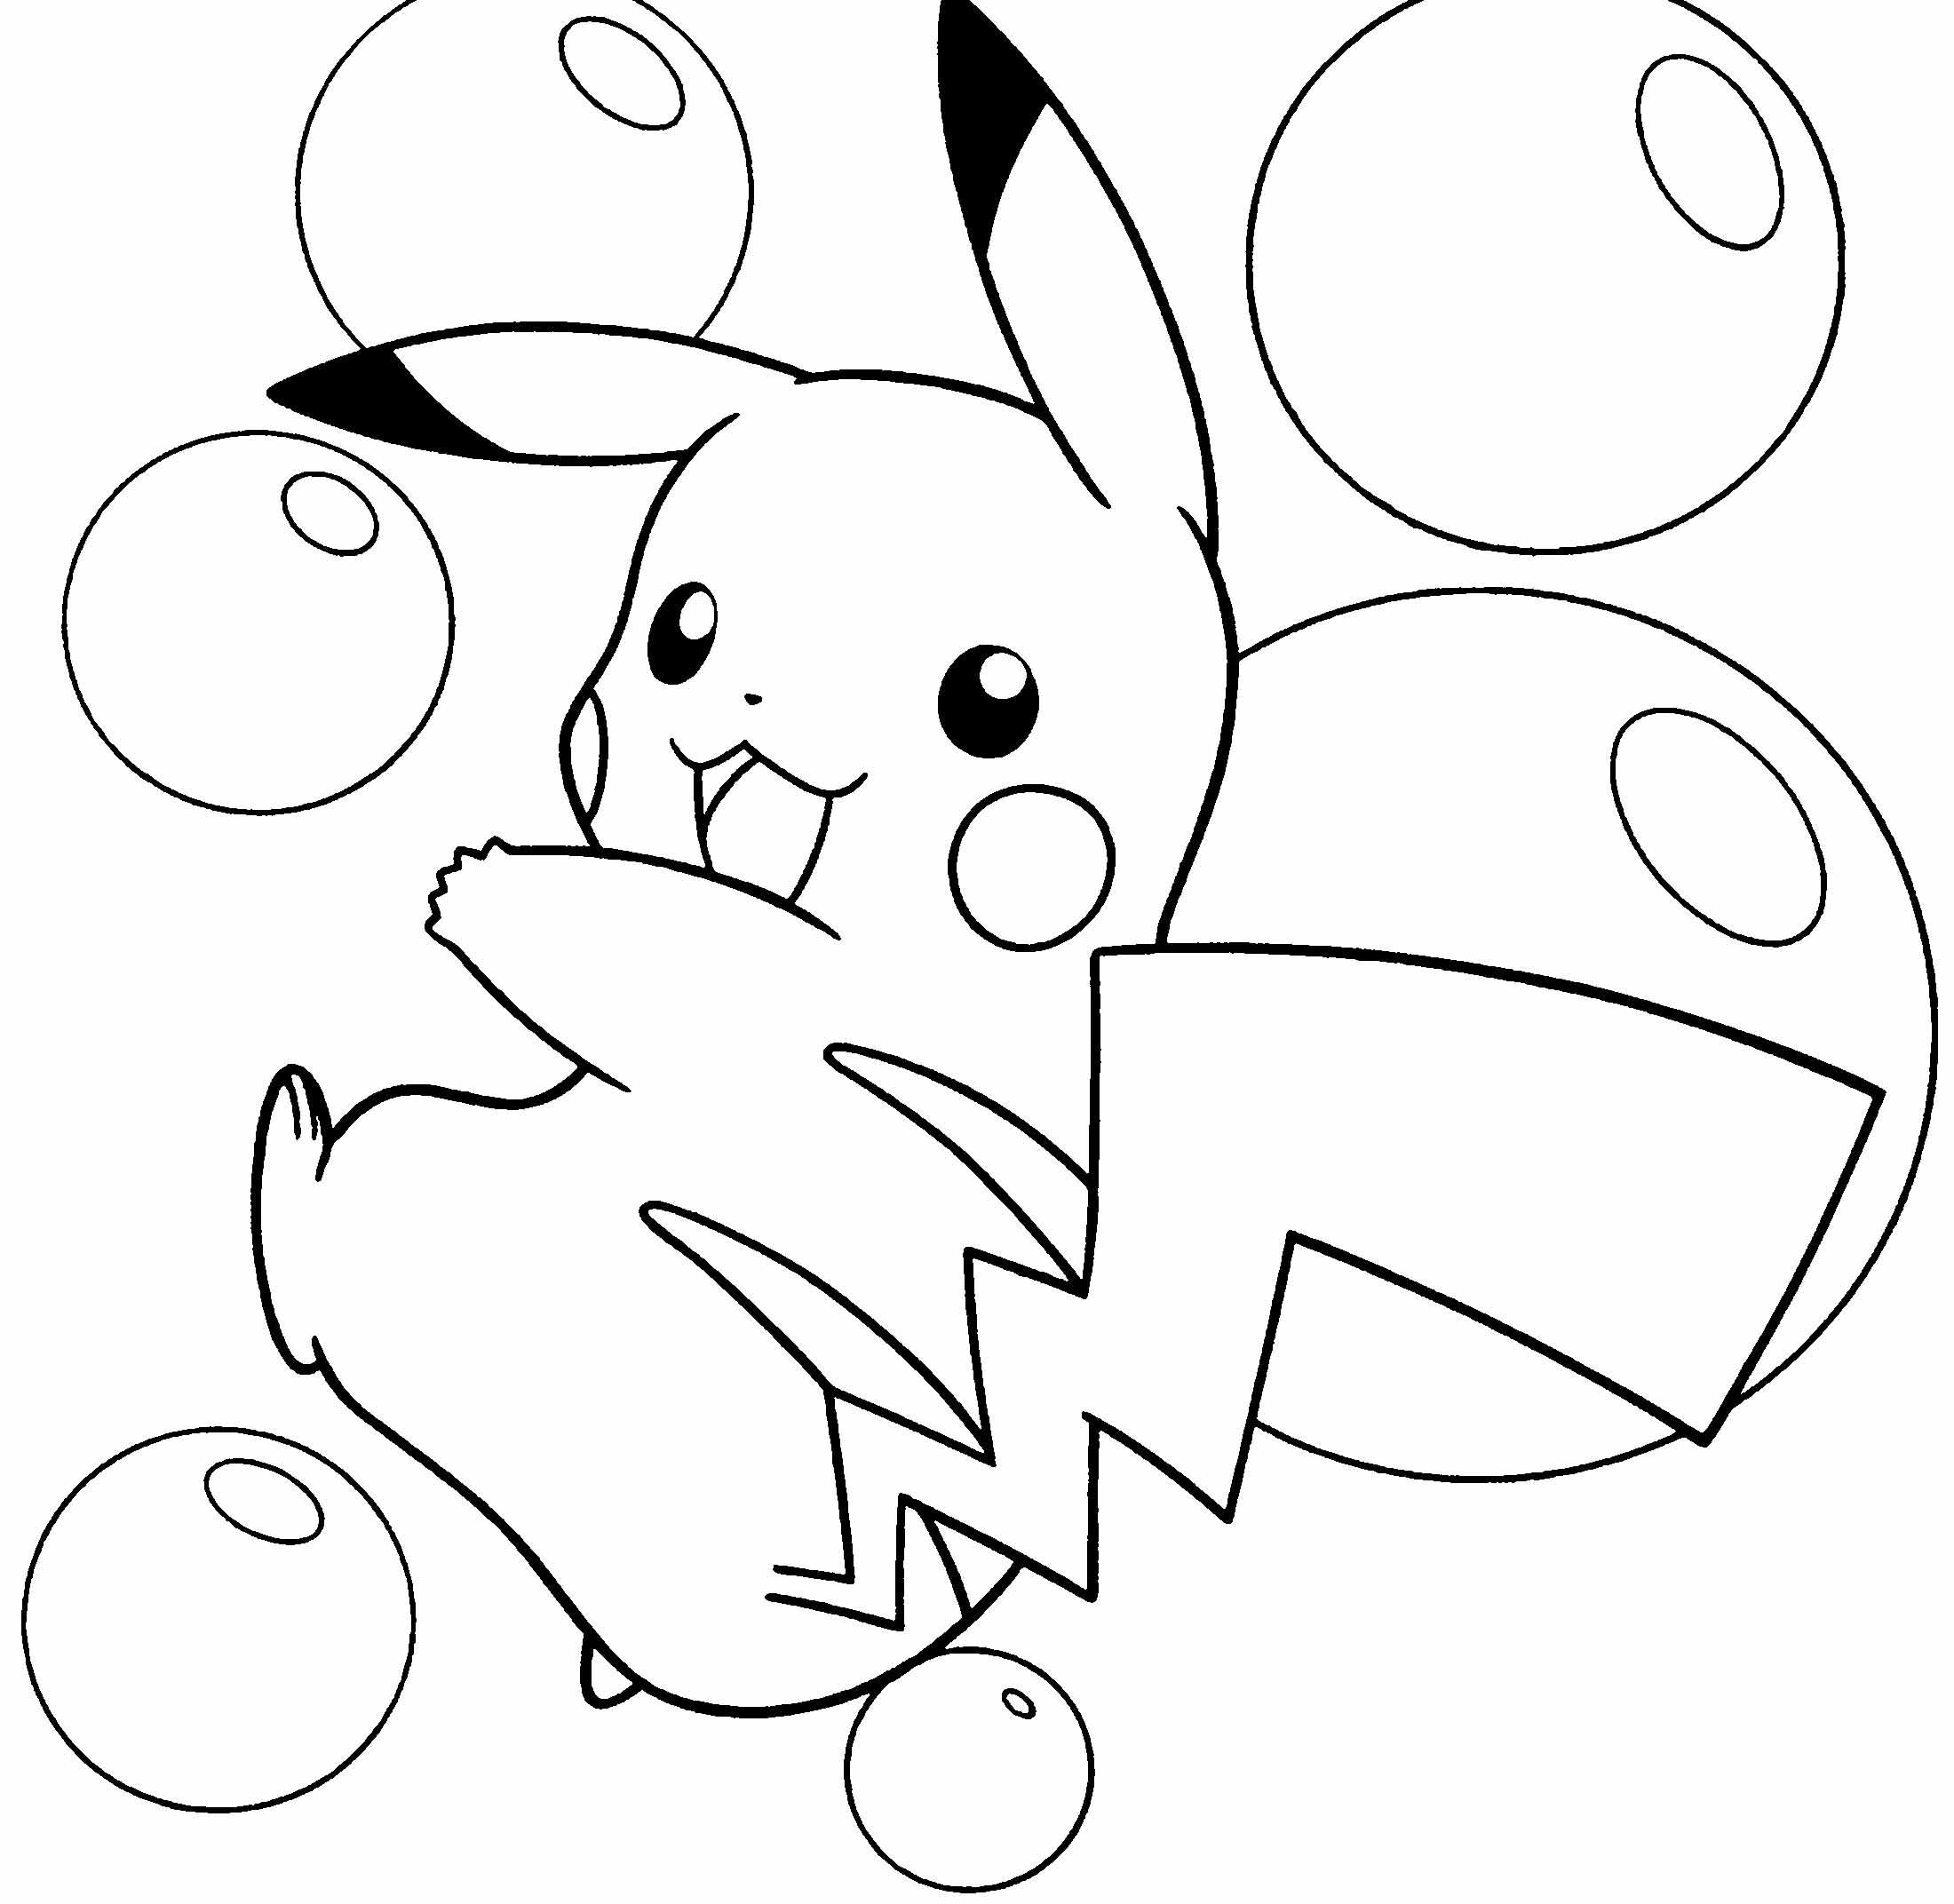 2200x2144 Pokemon Pikachu Coloring Pages Printable